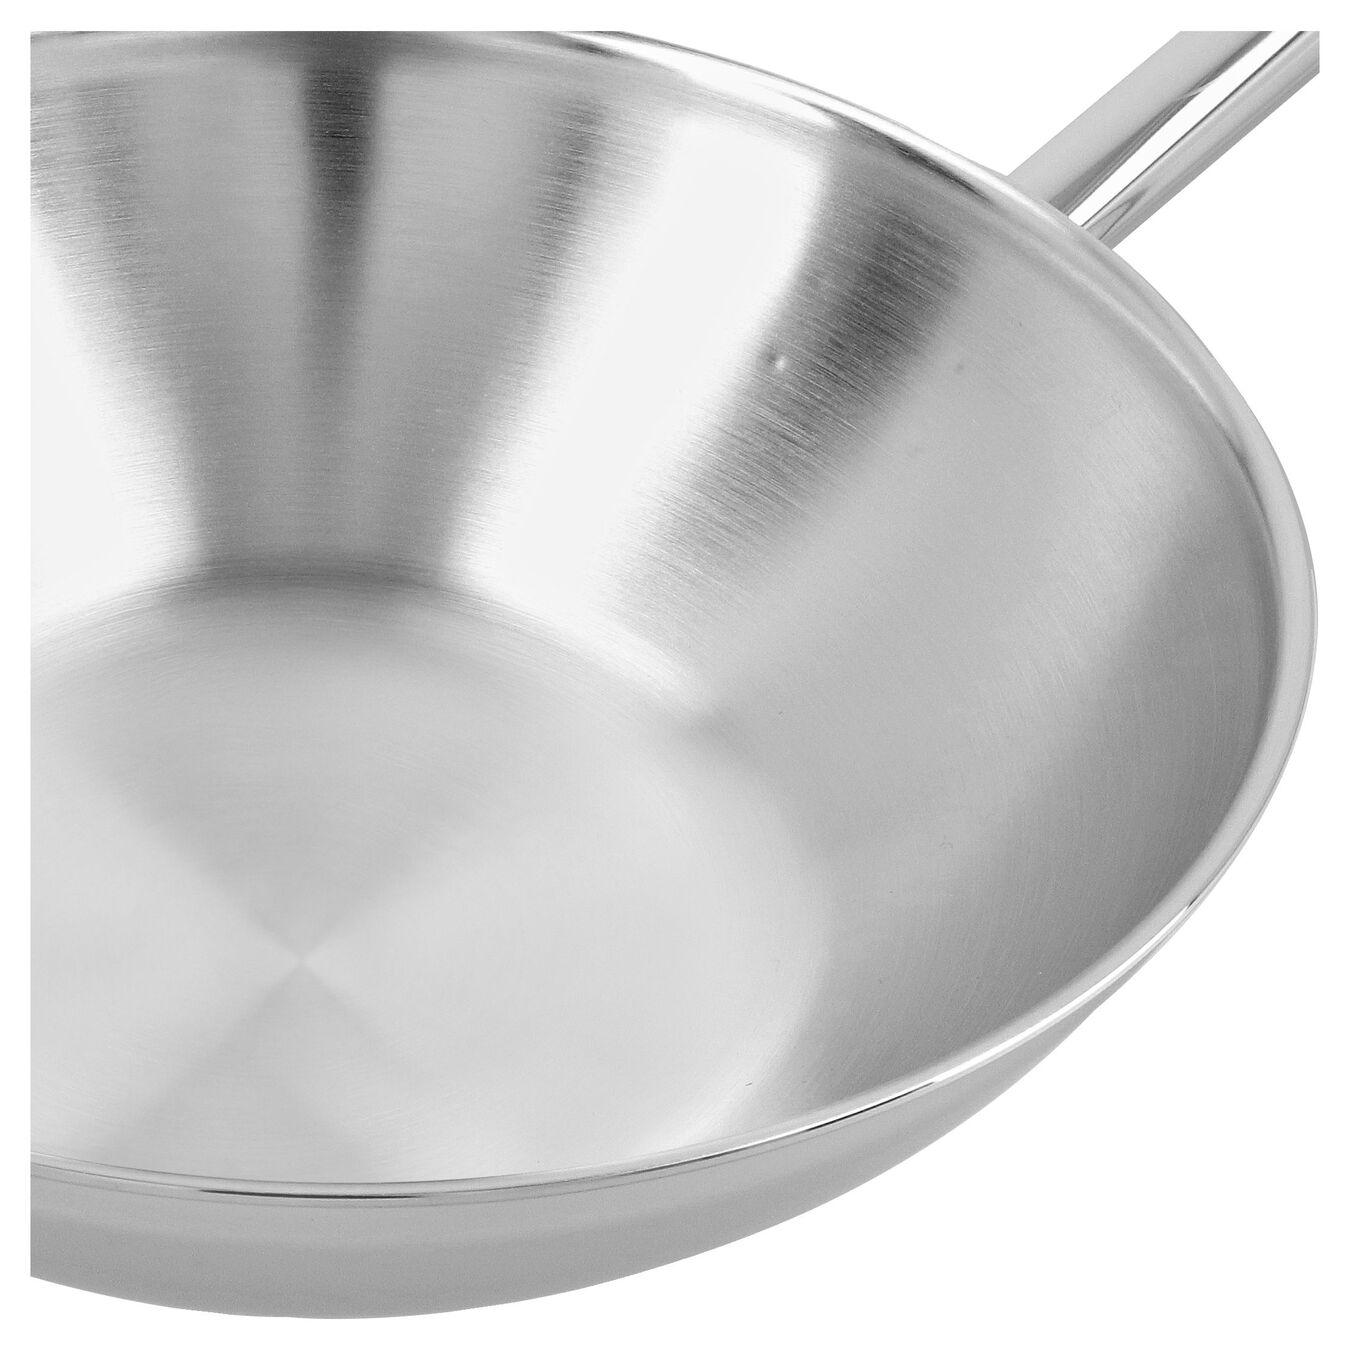 Wok vlakke bodem Zilver 30 cm,,large 3